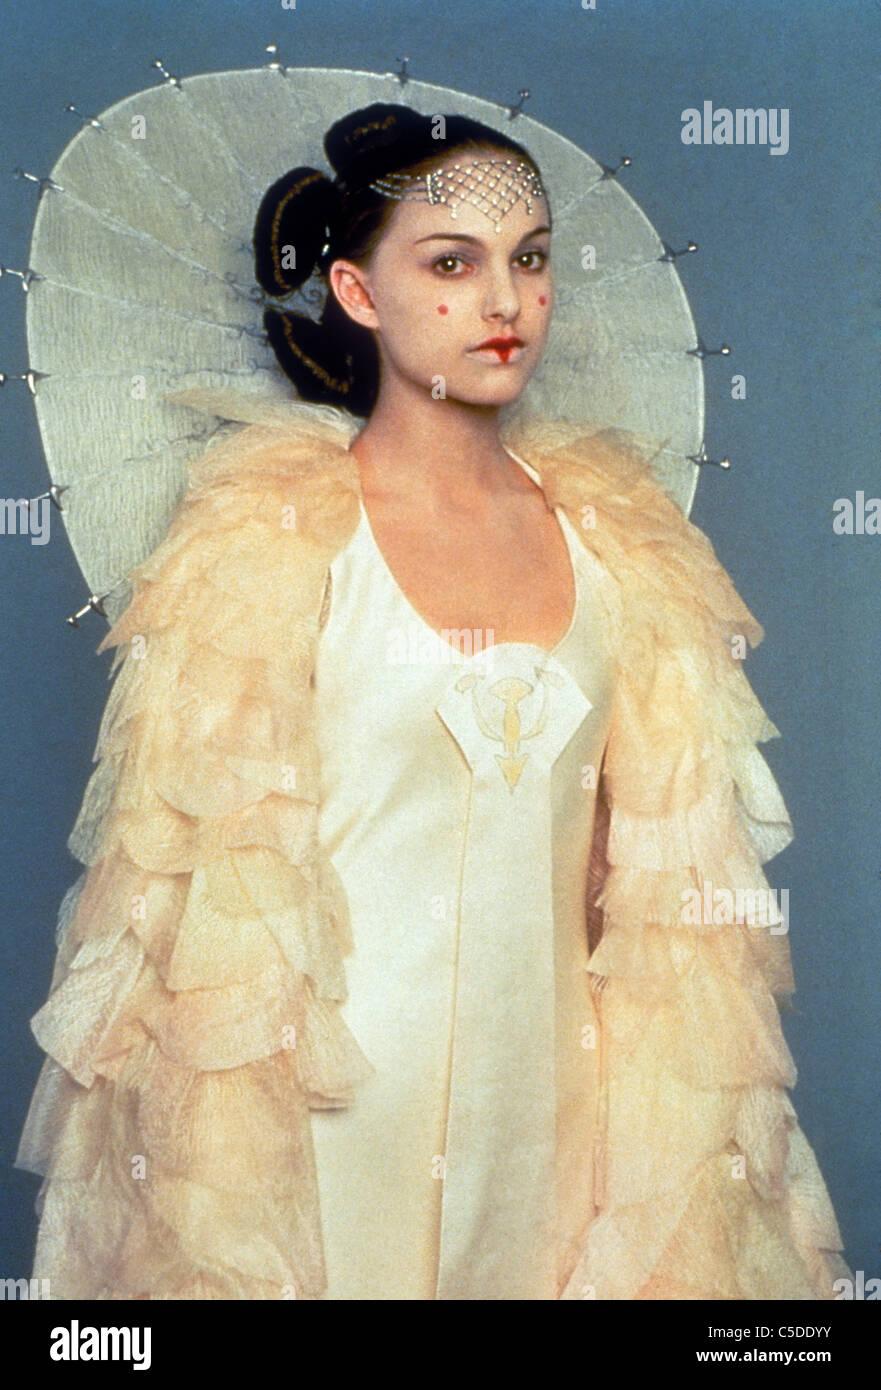 Natalie Portman Nude Star Wars 89